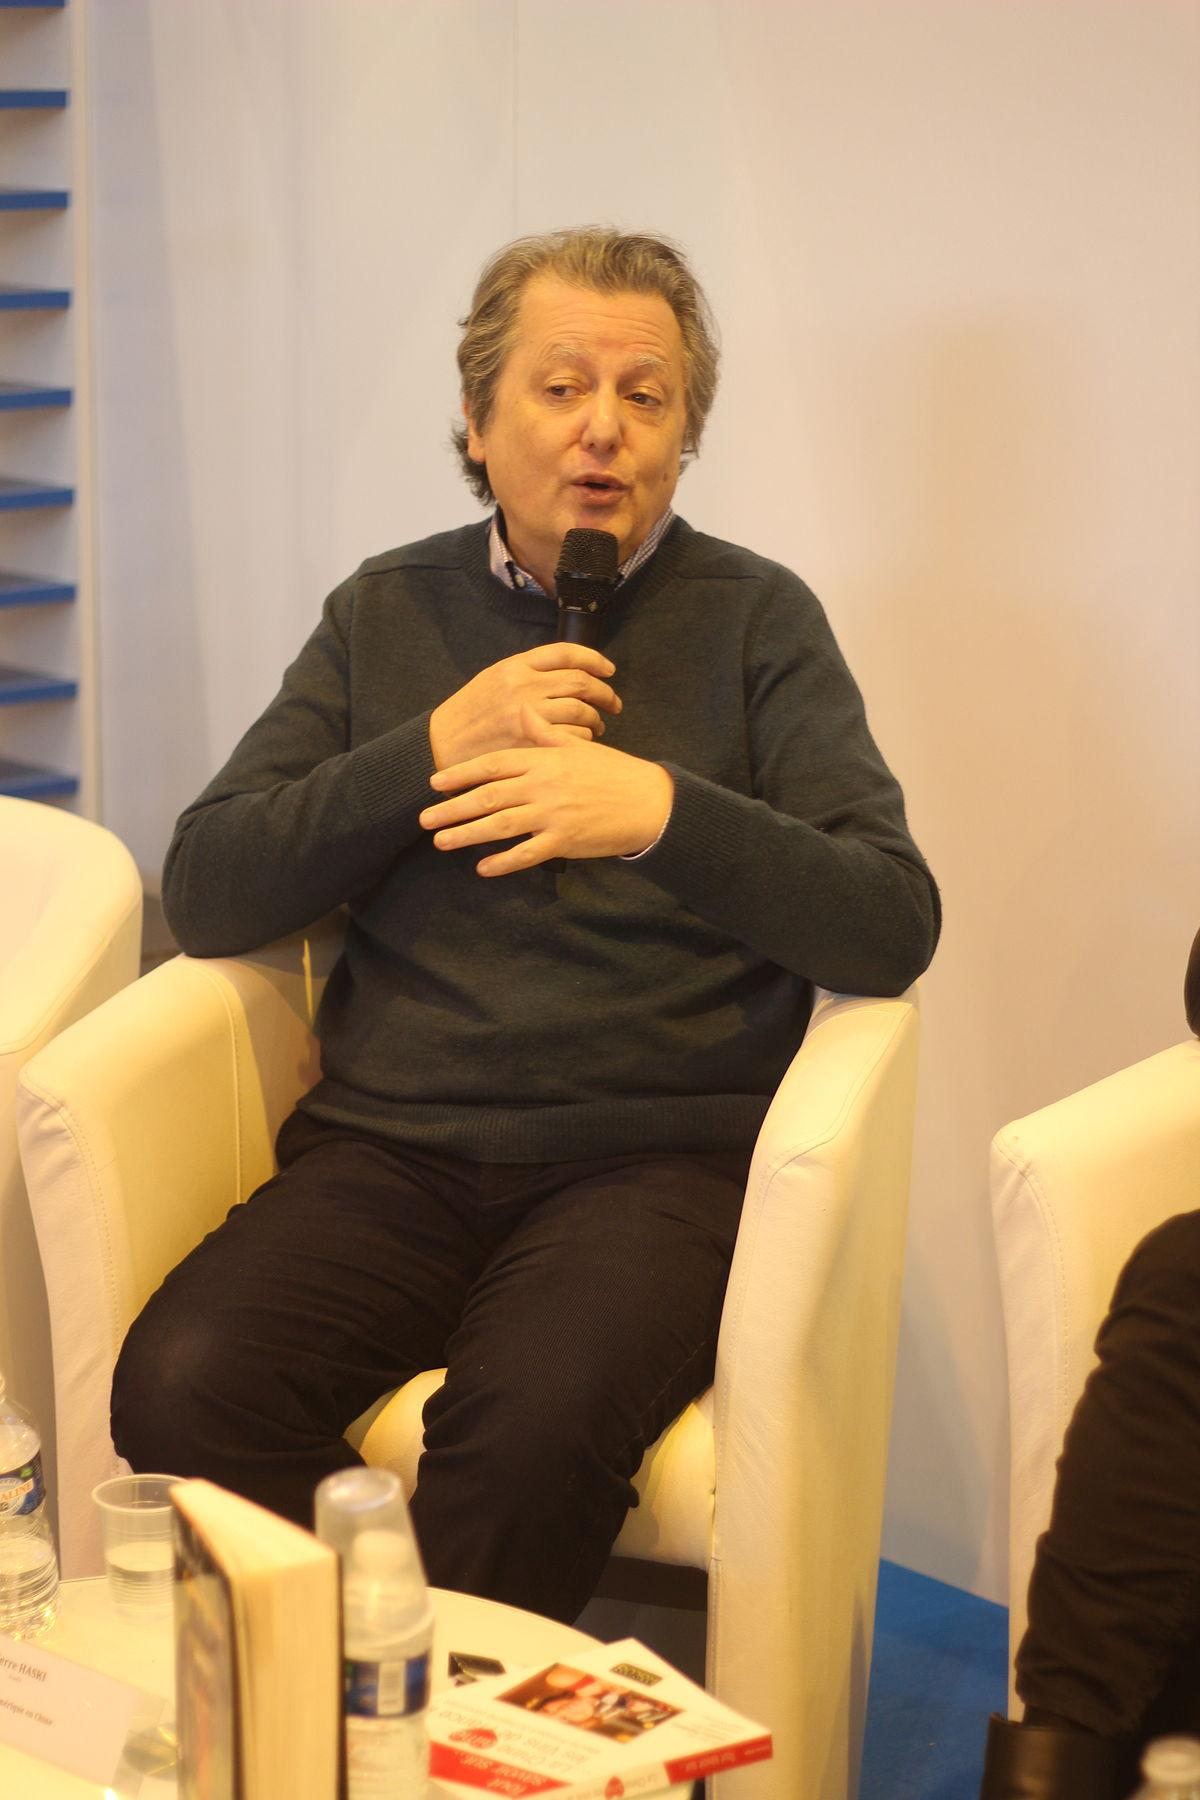 Pierre haski wikidata - Salon du livre brive ...